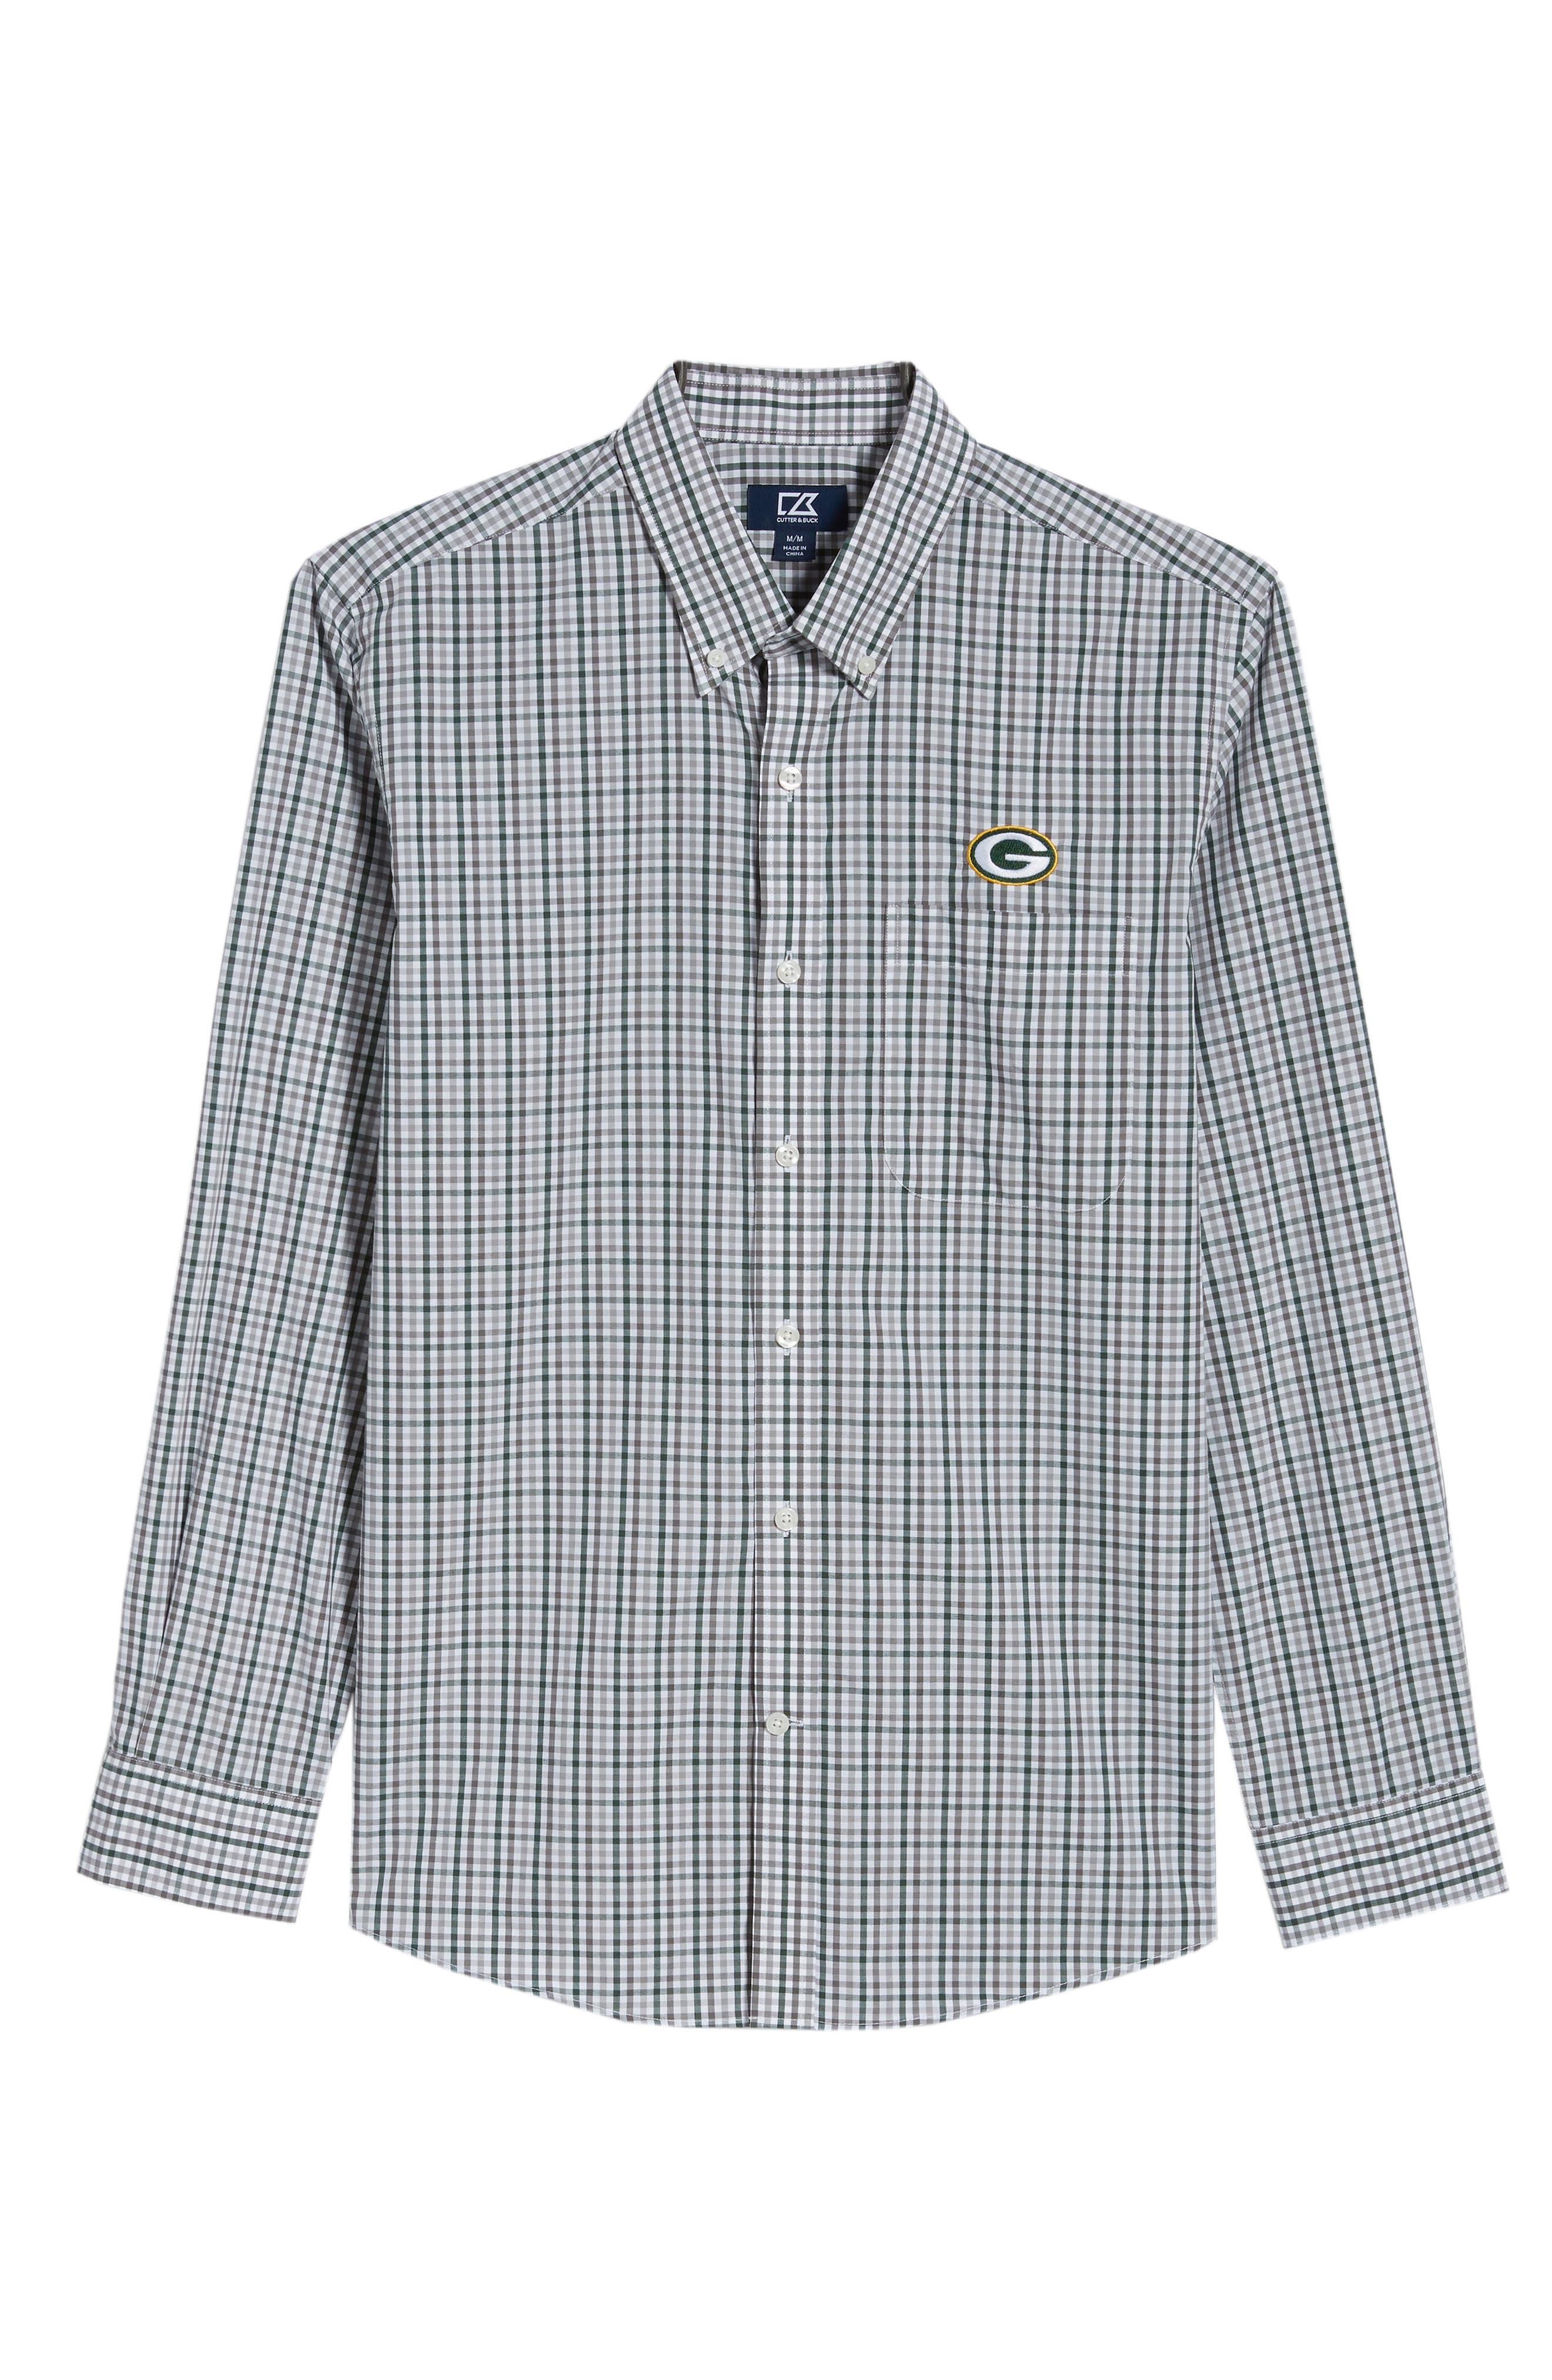 Green Bay Packers - Gilman Regular Fit Plaid Sport Shirt,                             Alternate thumbnail 6, color,                             HUNTER